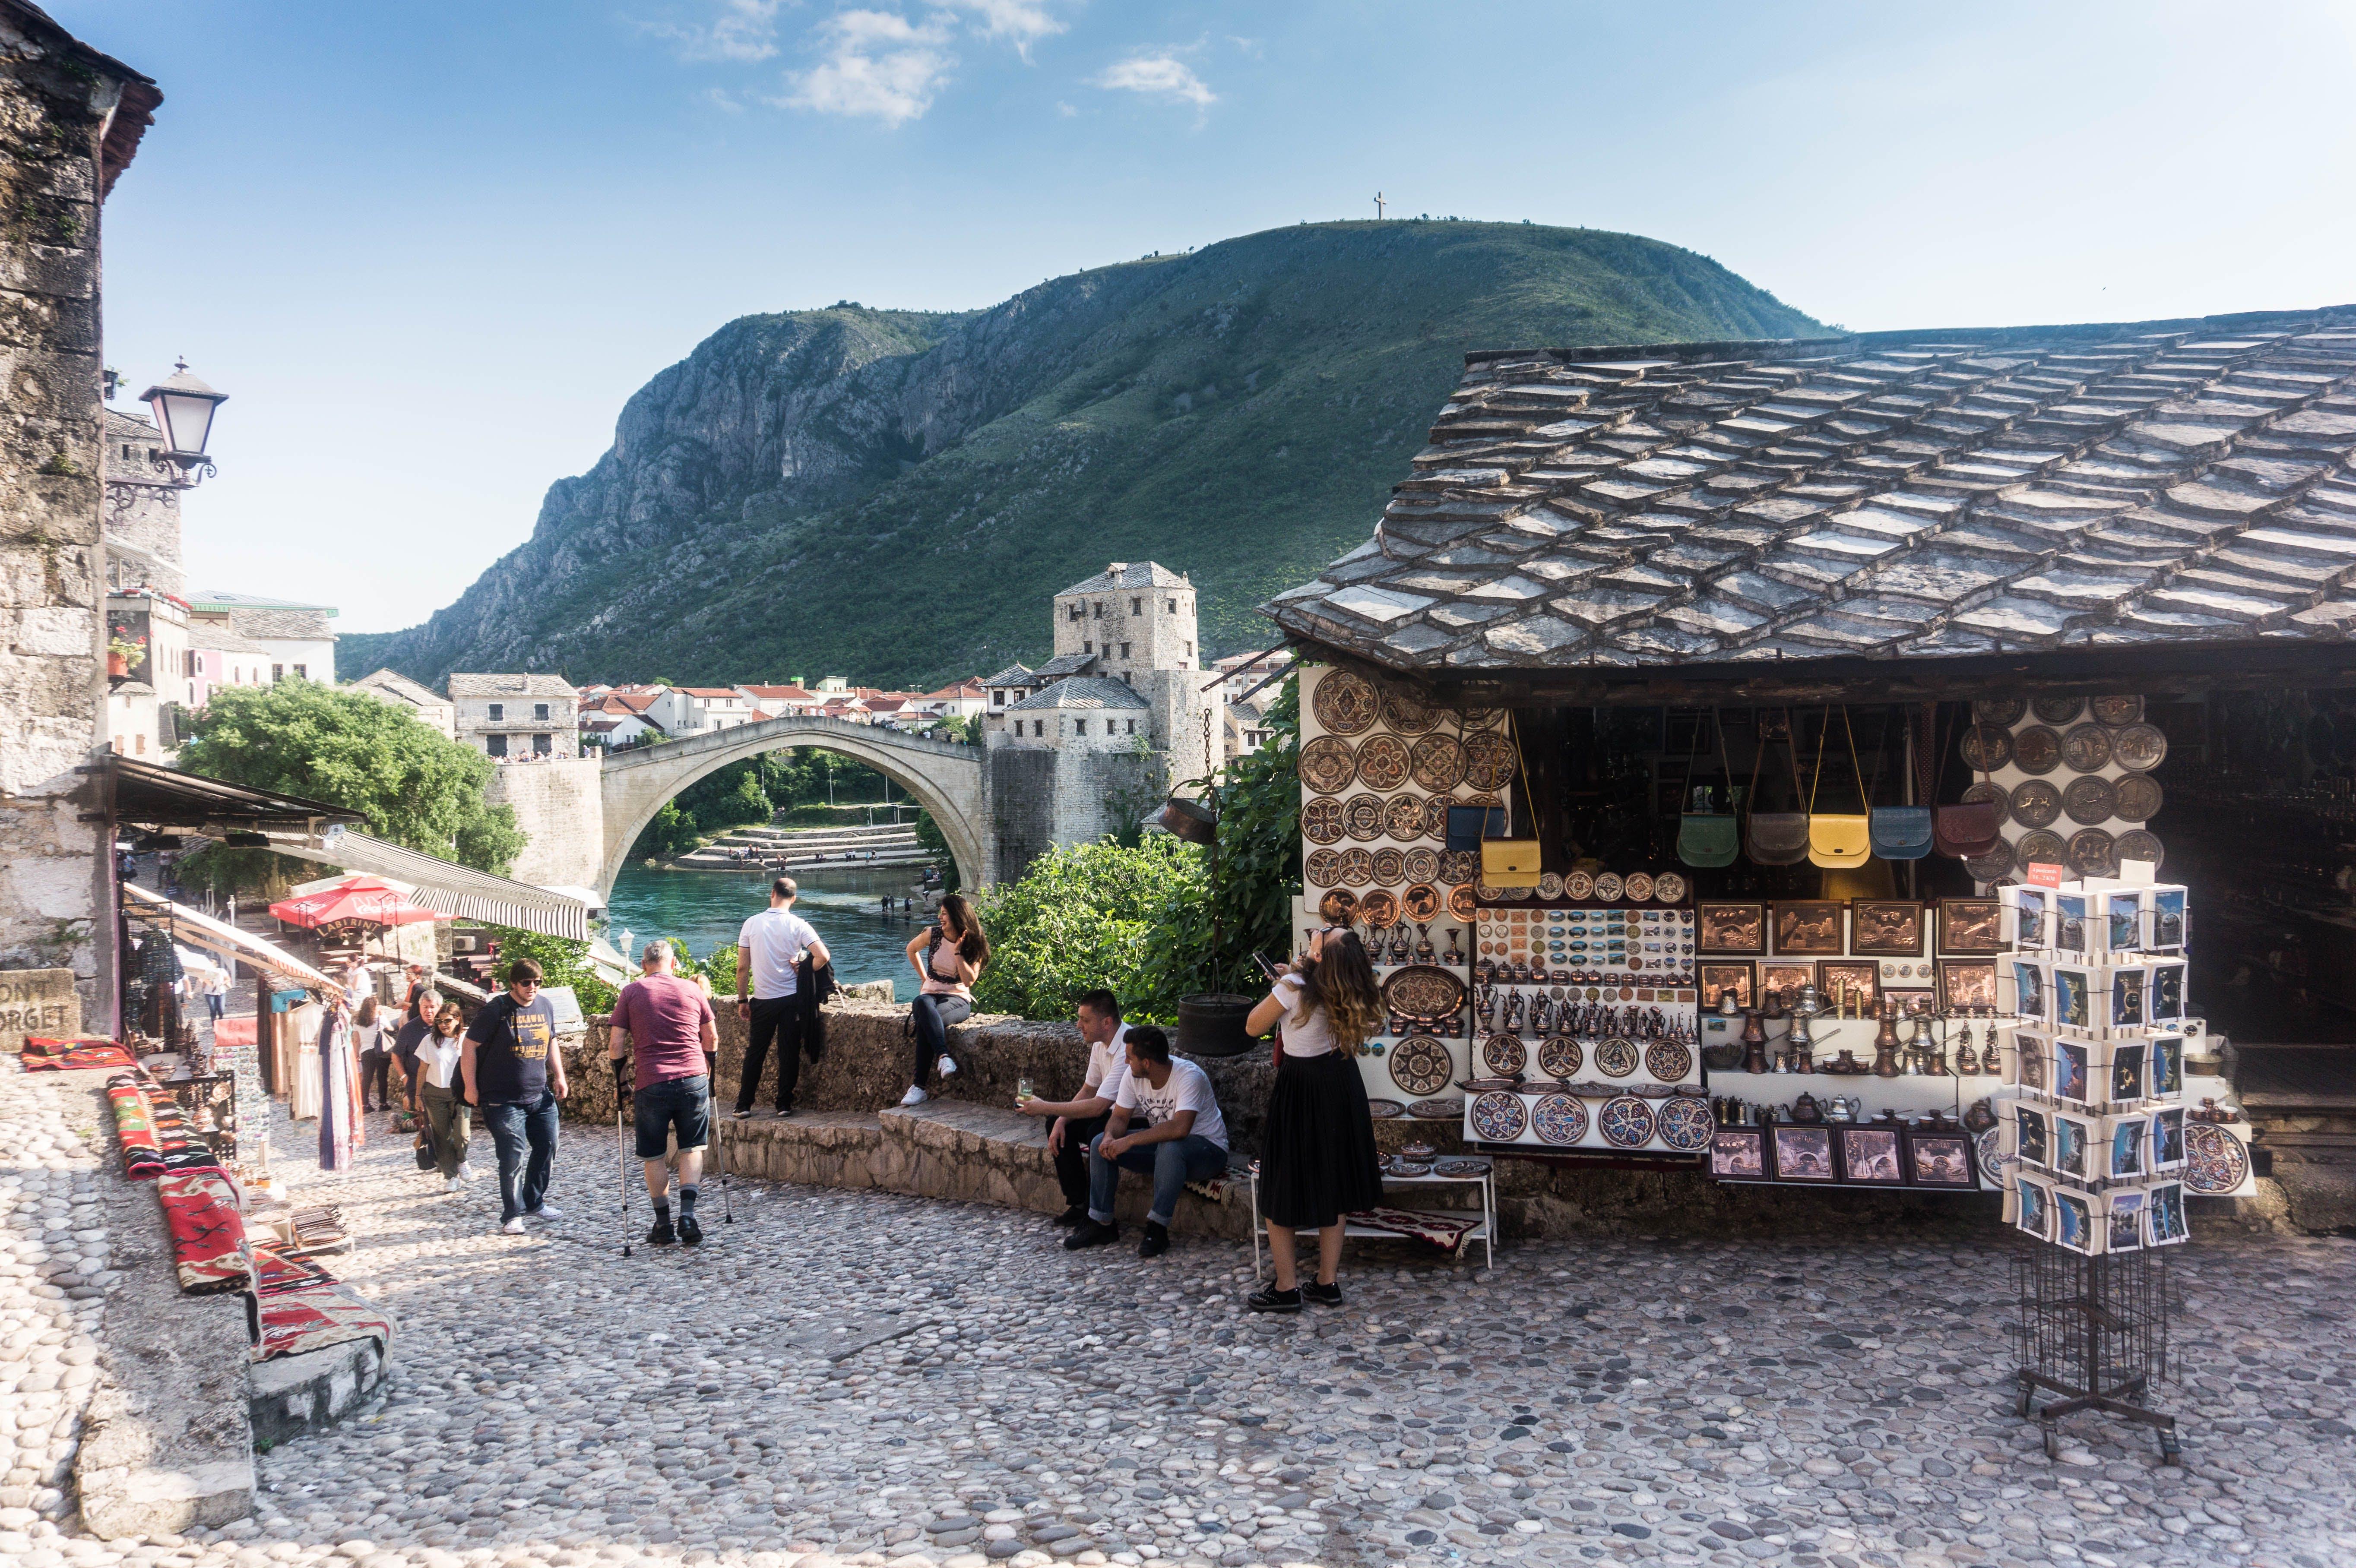 Photography of Village Near Mountain